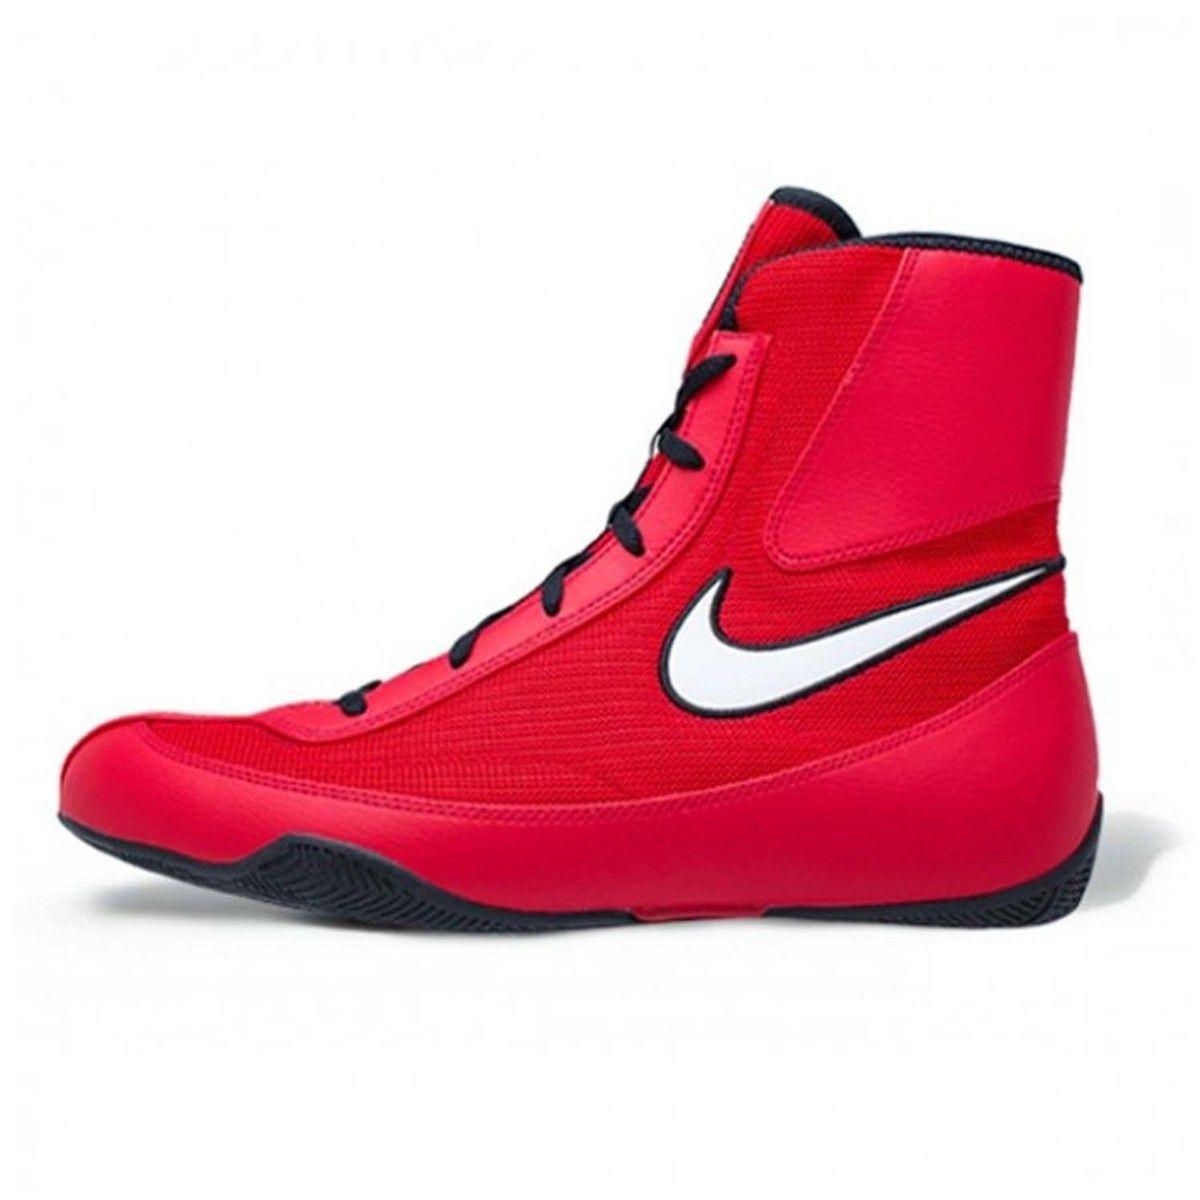 Nike Machomai 2 Boxing Boots Red/White